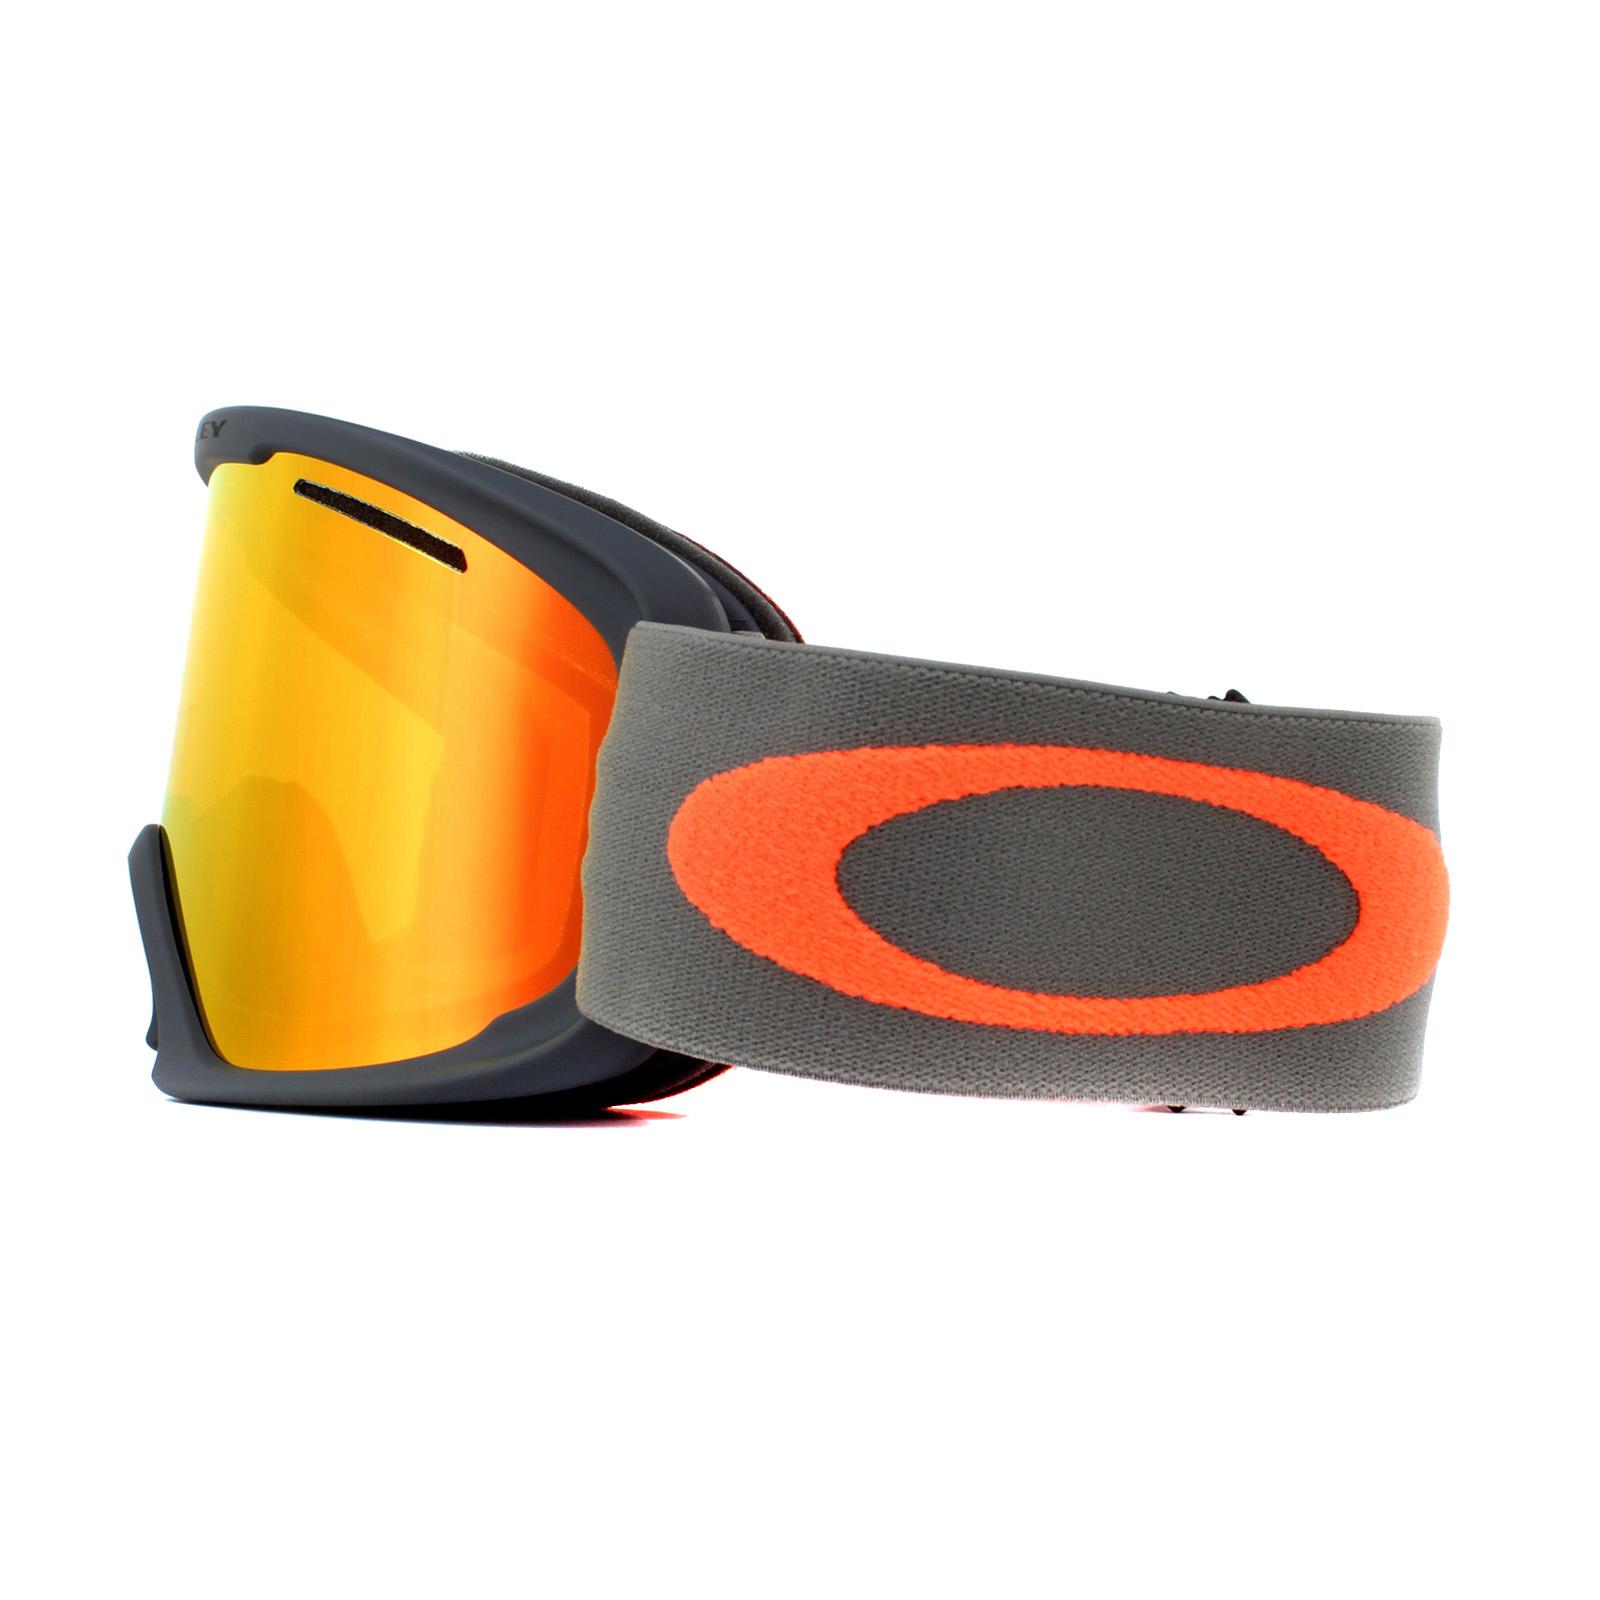 785bb7bfd2 Sentinel Oakley Ski Goggles O2 XL OO7045-42 Forged Iron Brush Fire Iridium